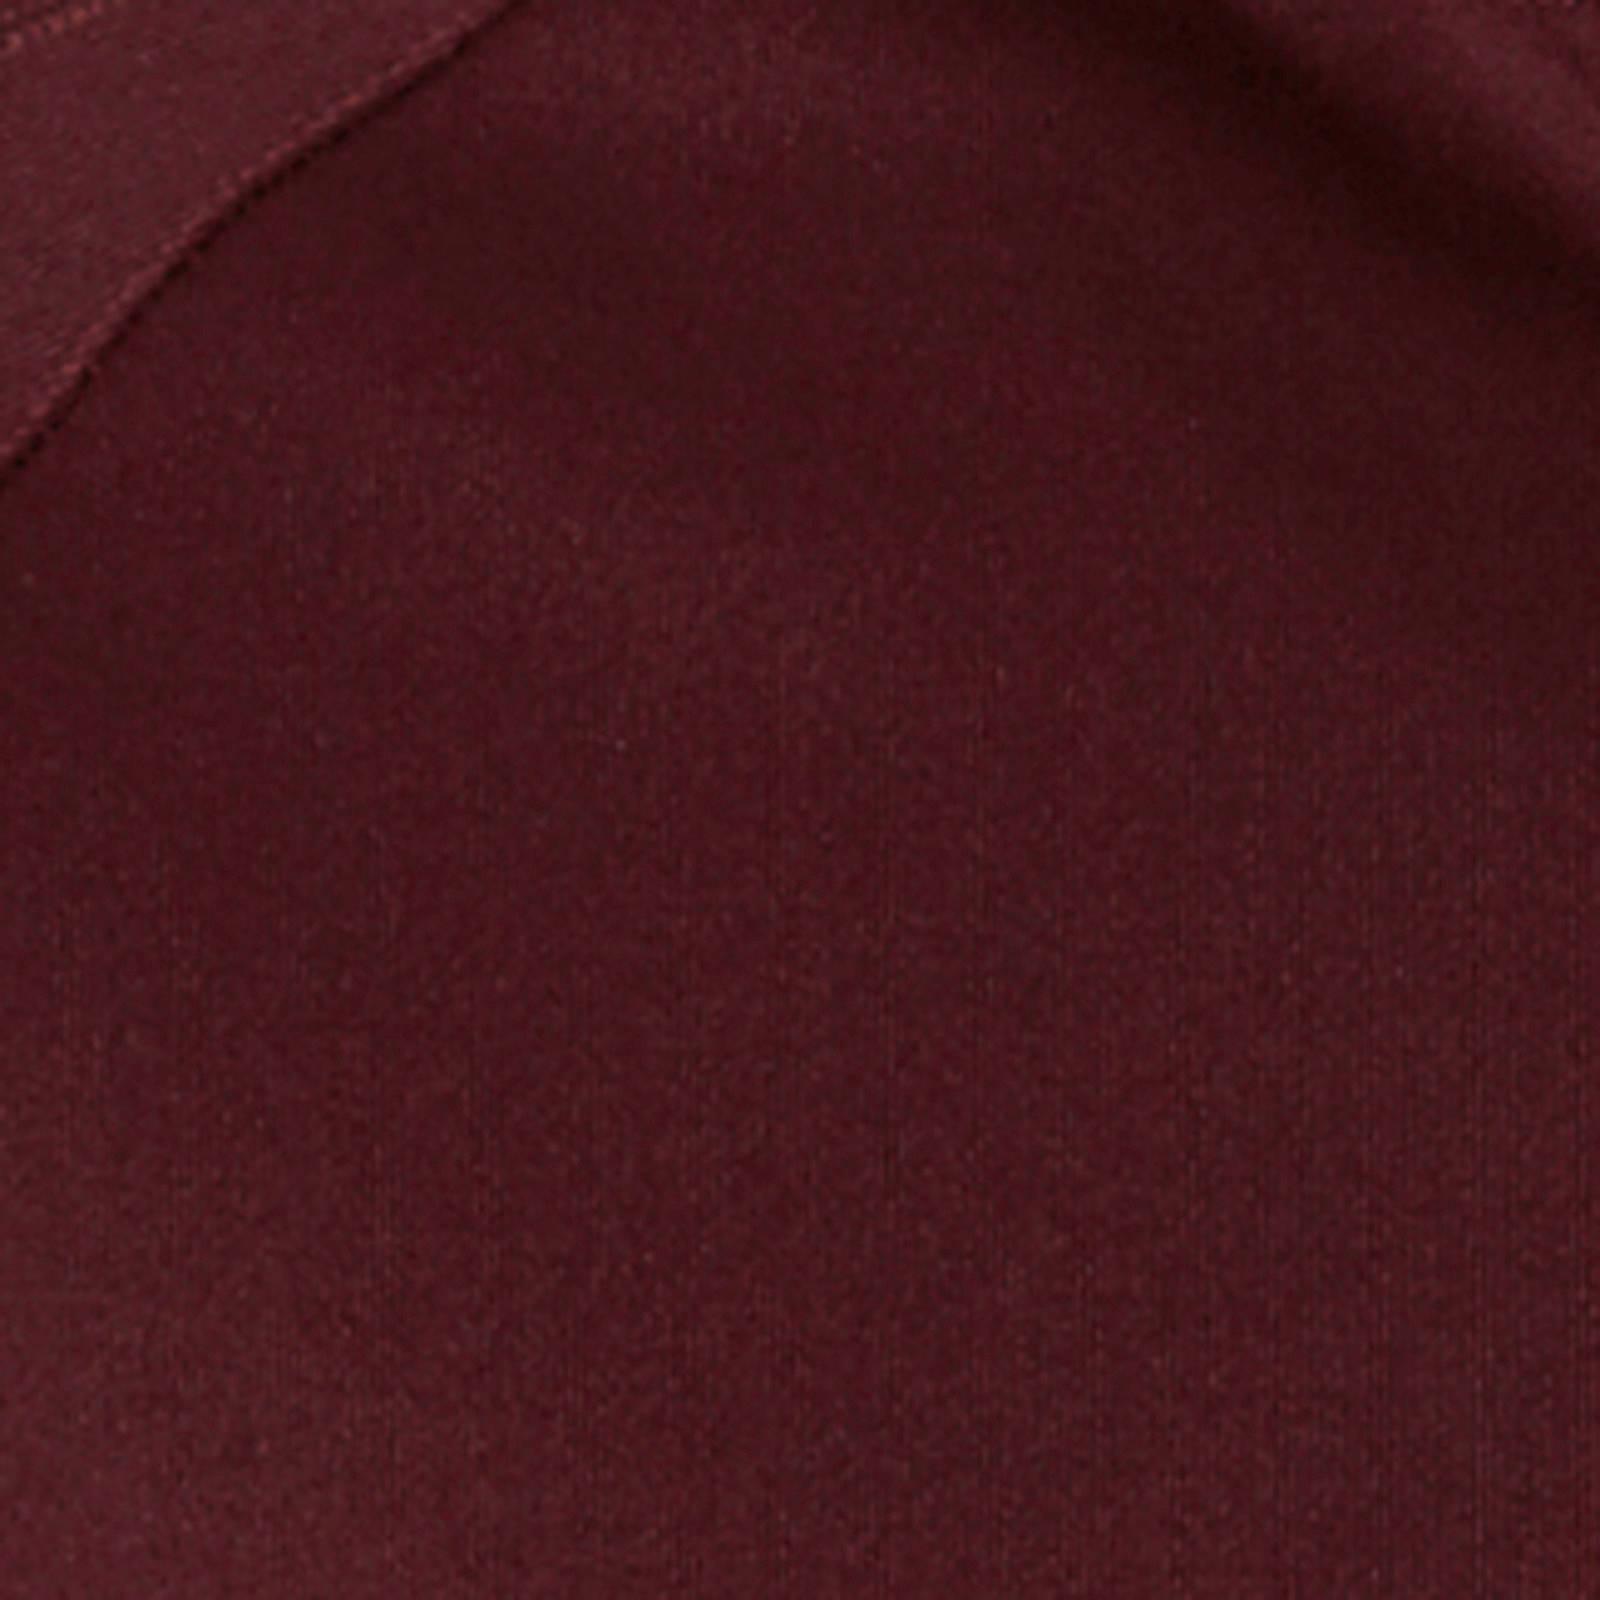 adidas Originals vest donkerrood | wehkamp